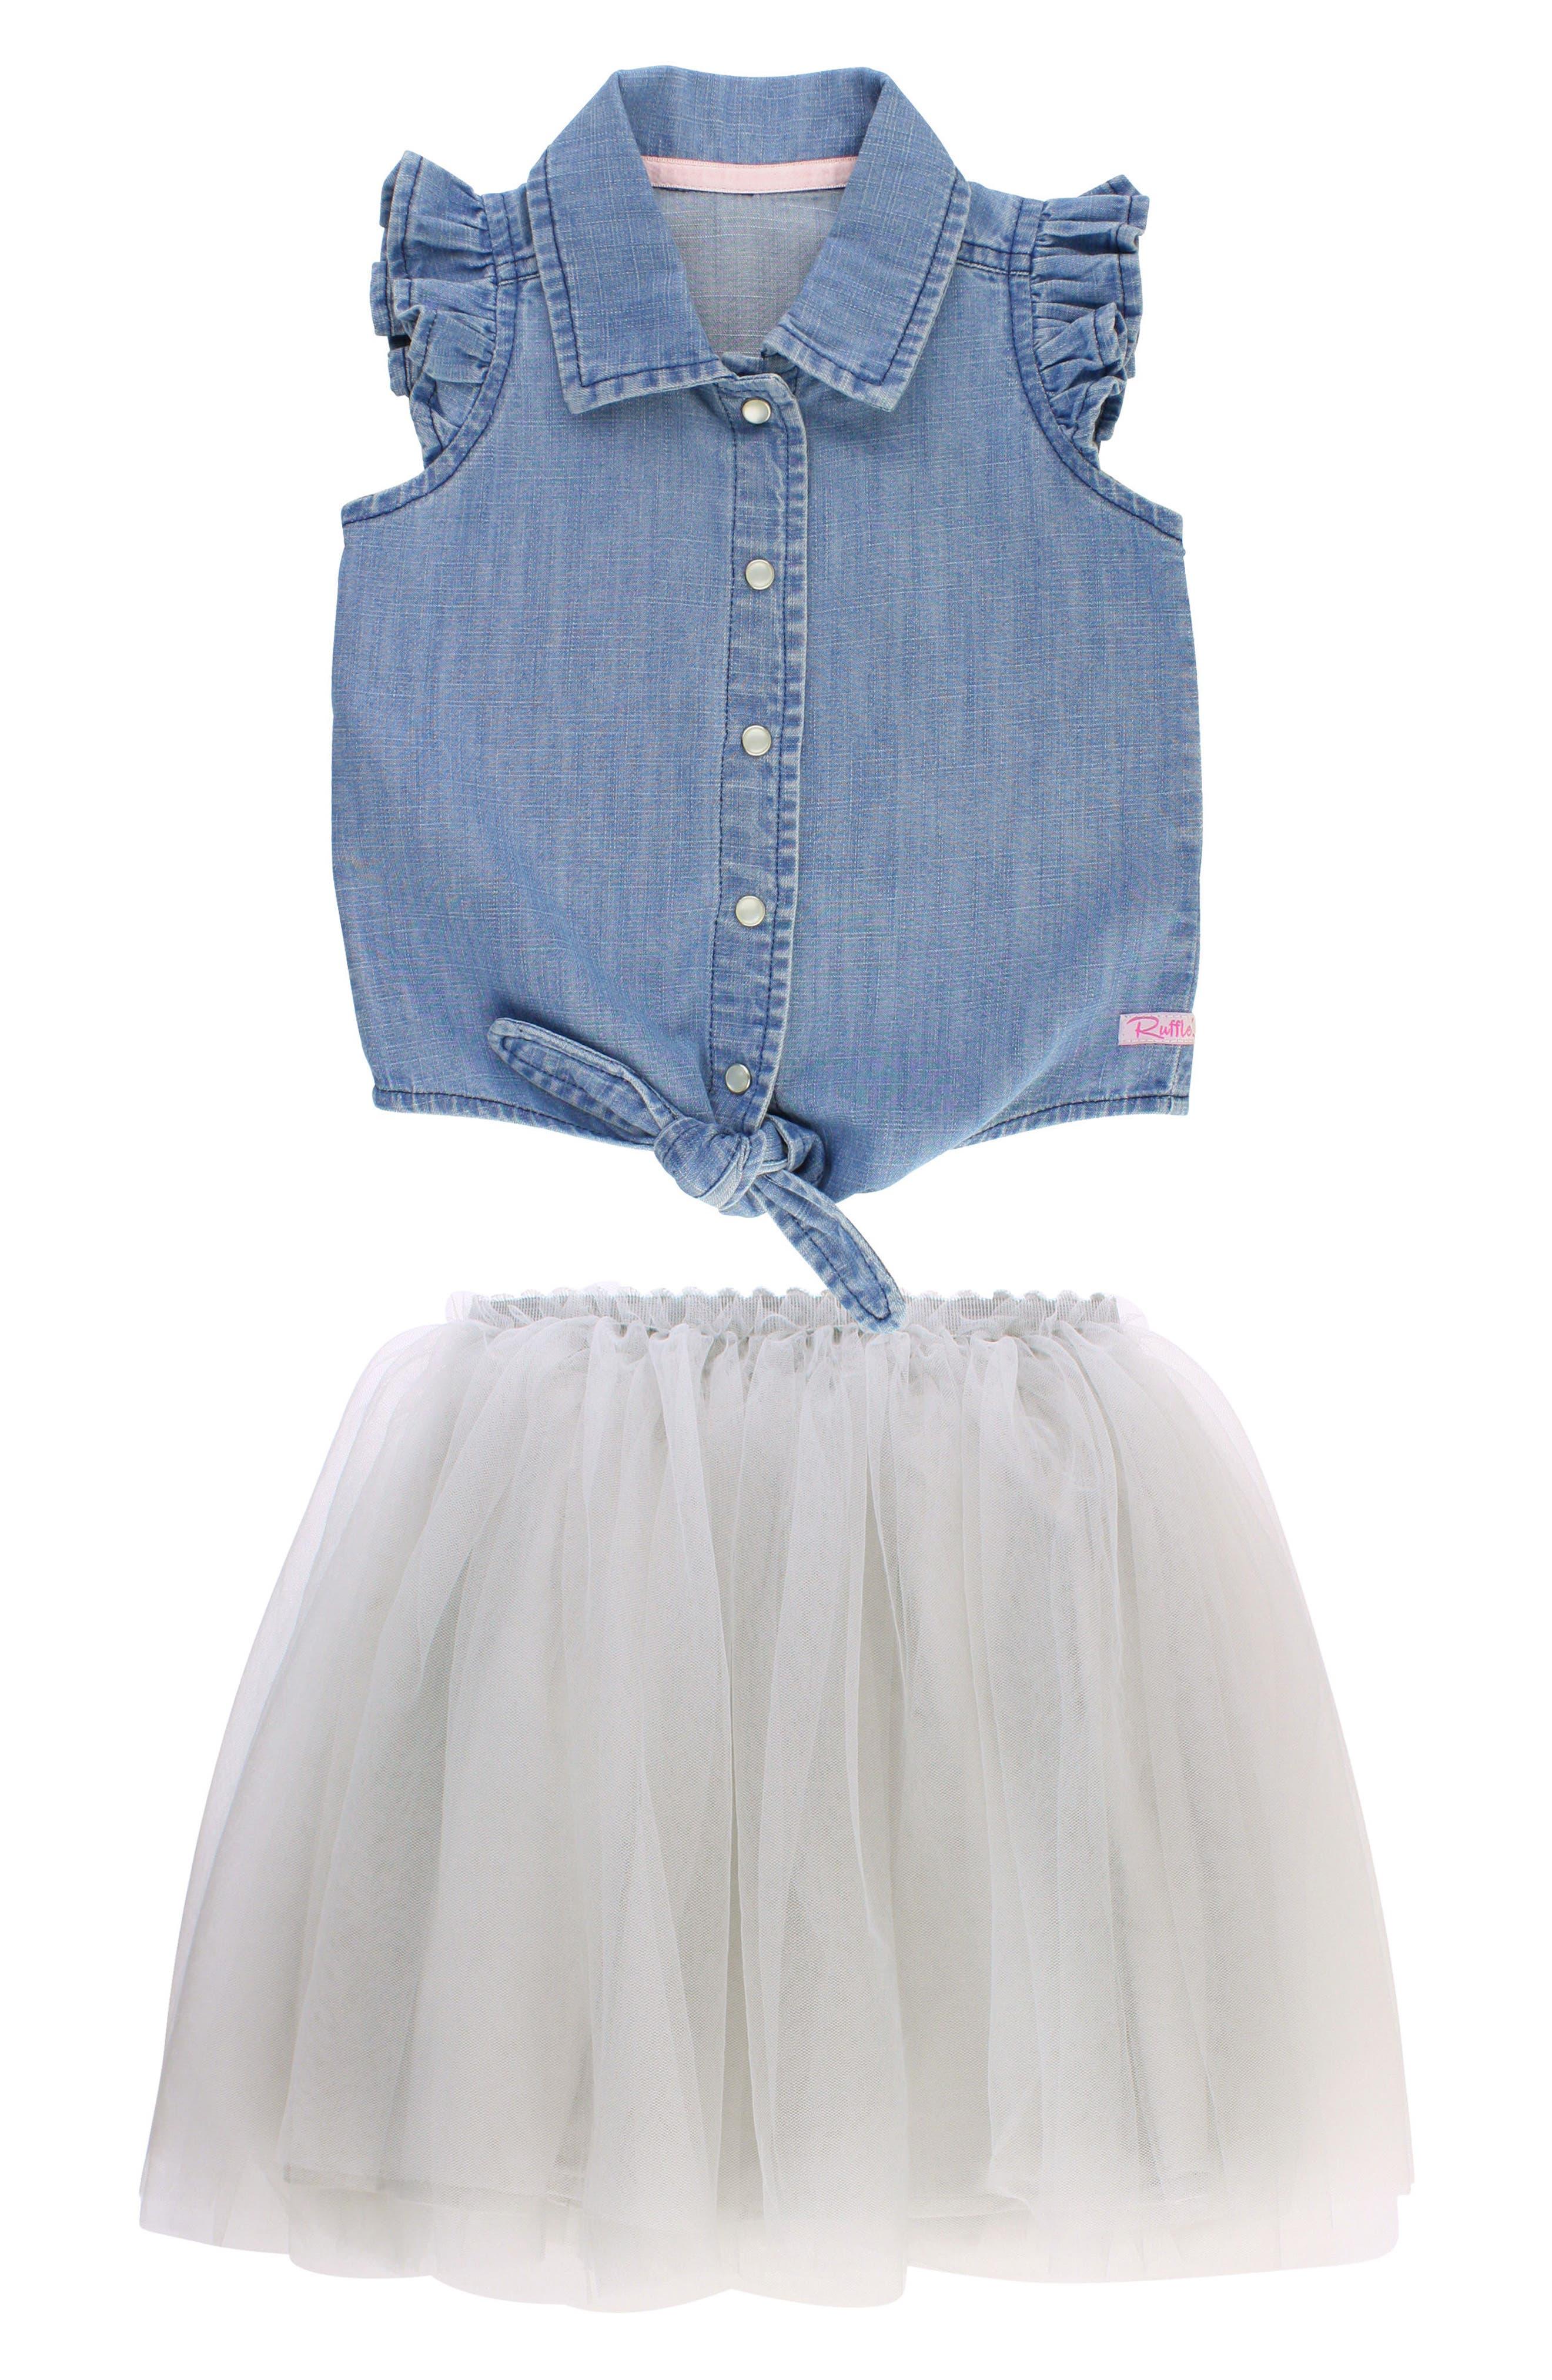 RUFFLEBUTTS, Chambray Tie Top & Tulle Skirt Set, Main thumbnail 1, color, GRAY